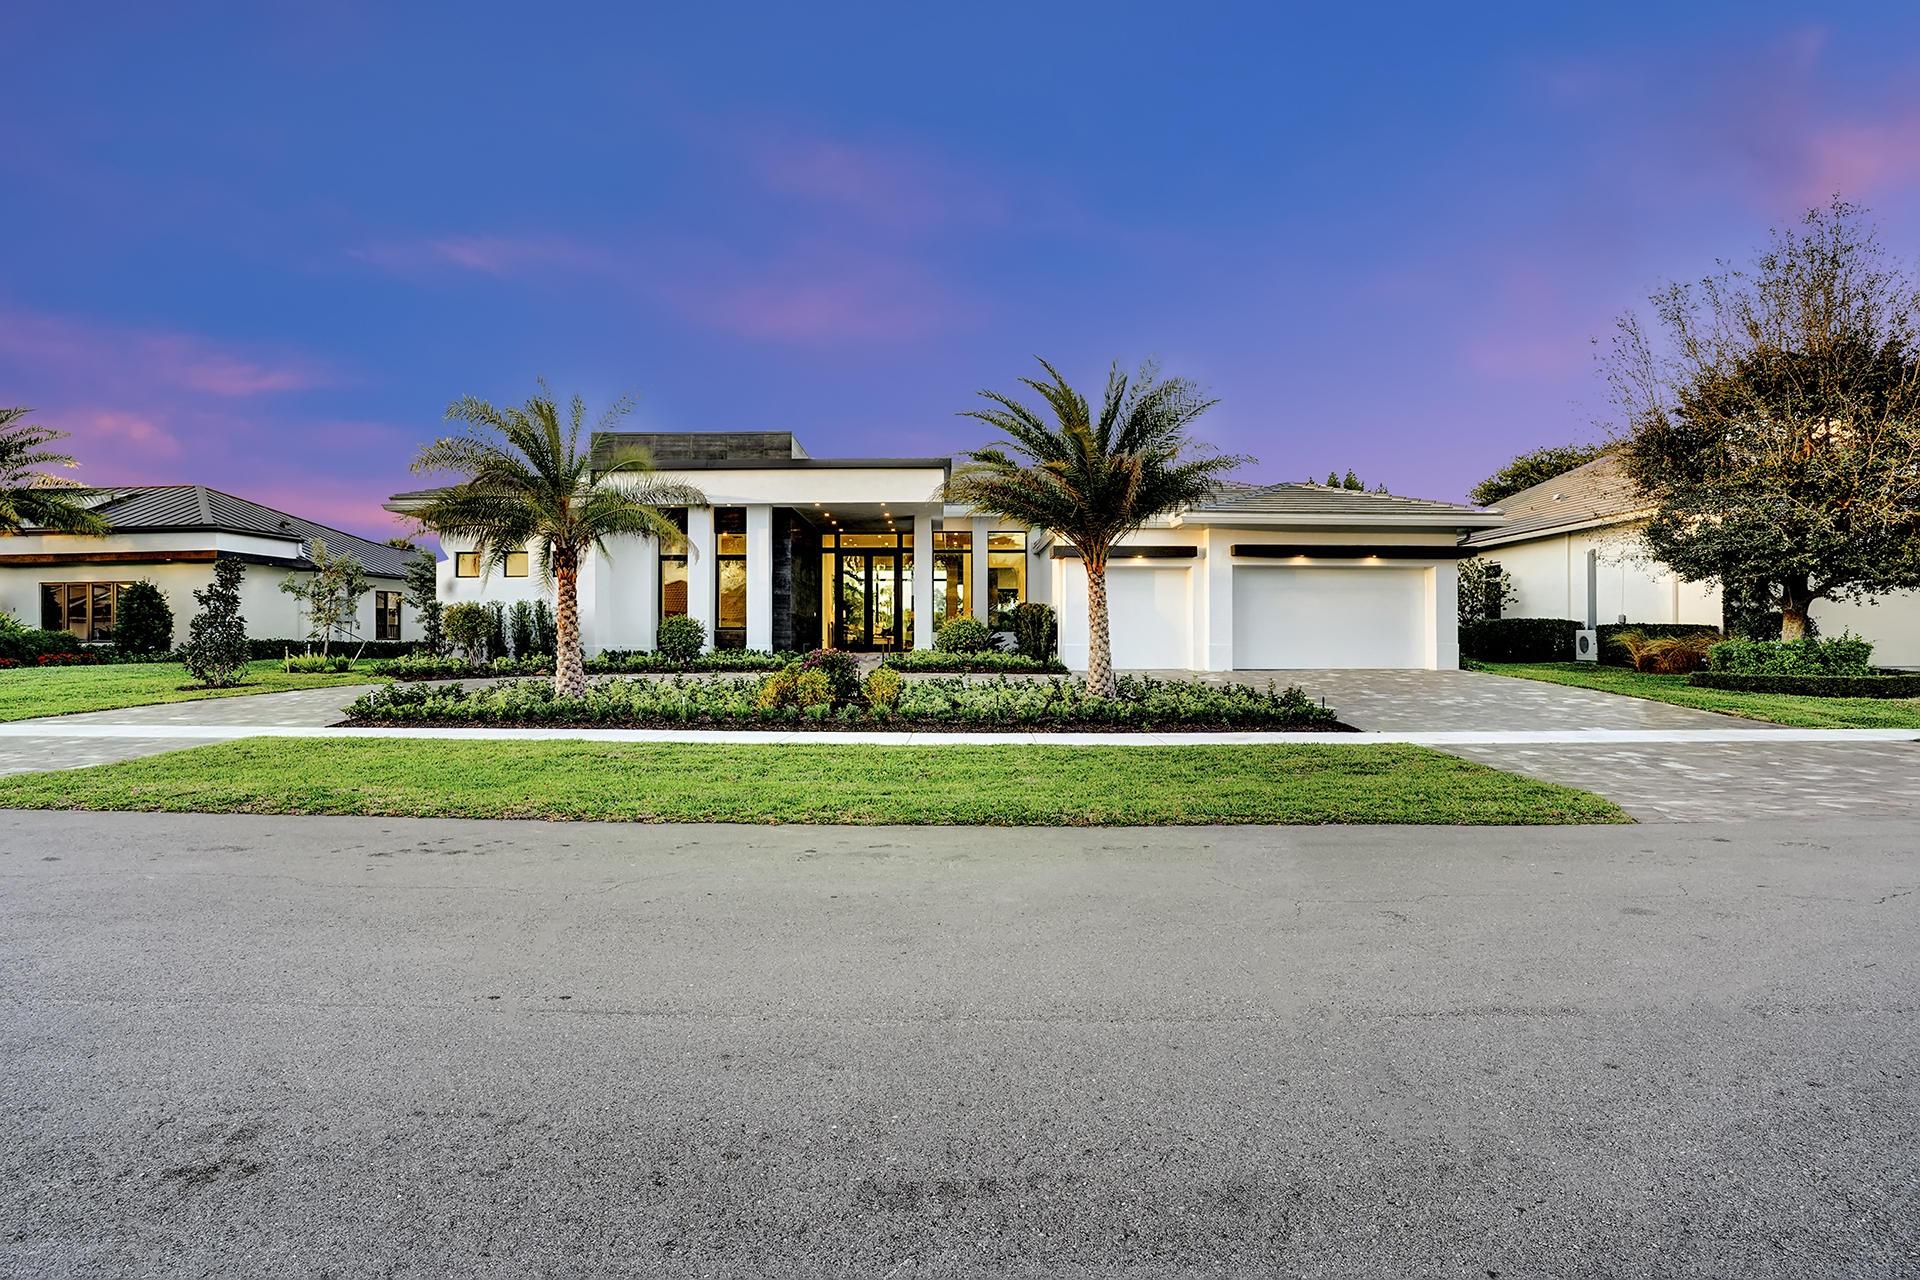 Photo of 4533 White Cedar Lane, Delray Beach, FL 33445